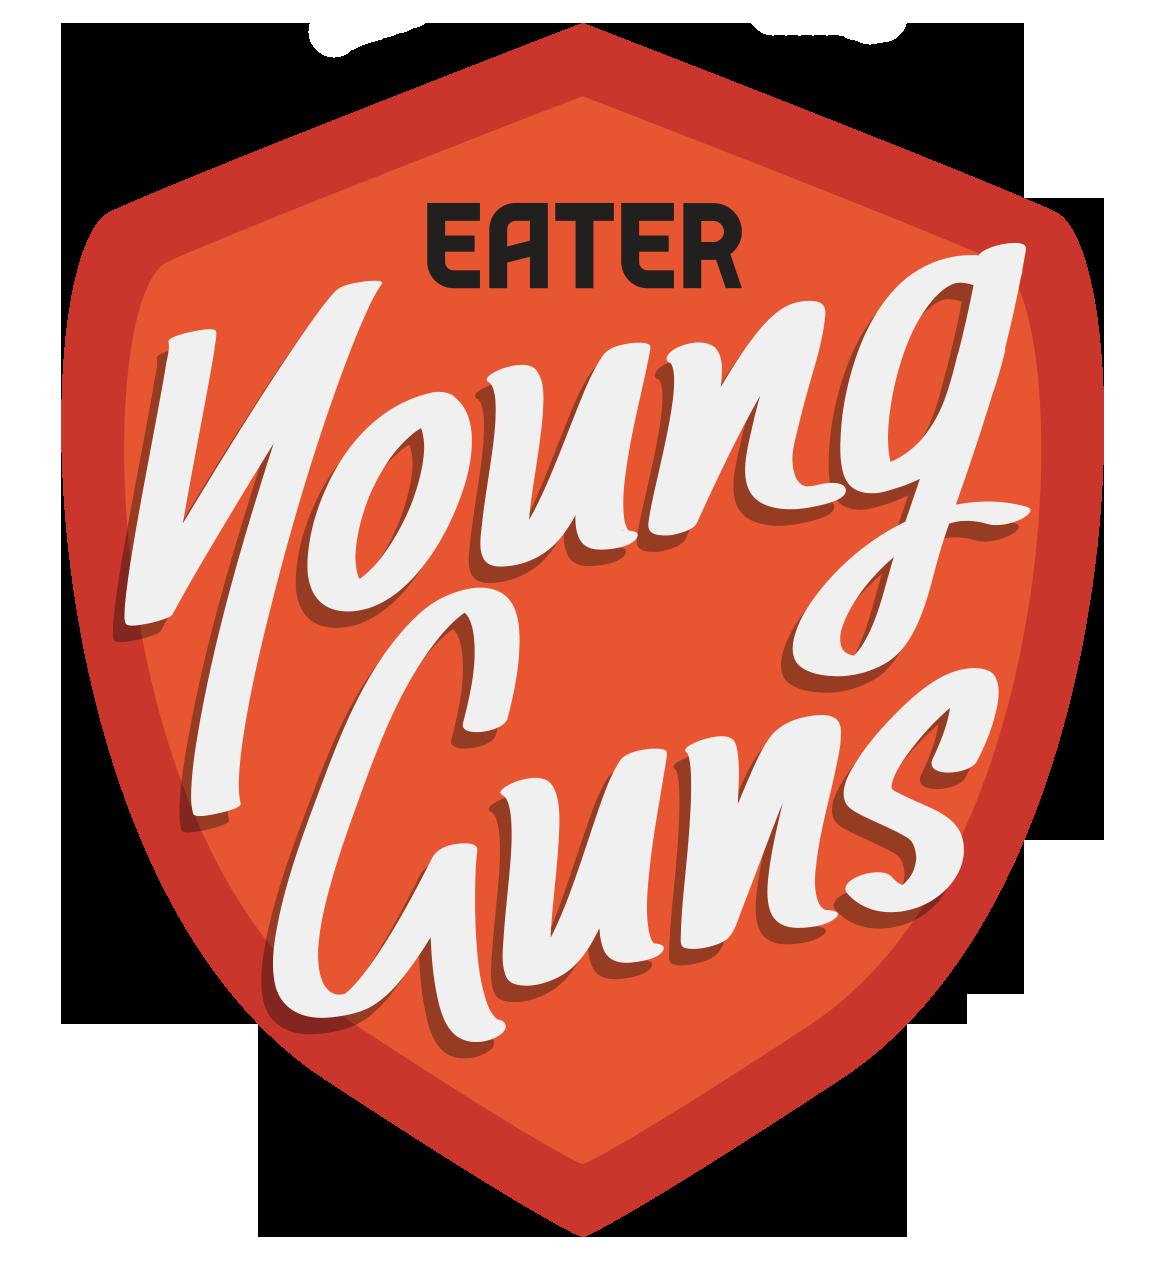 Eater Young Guns